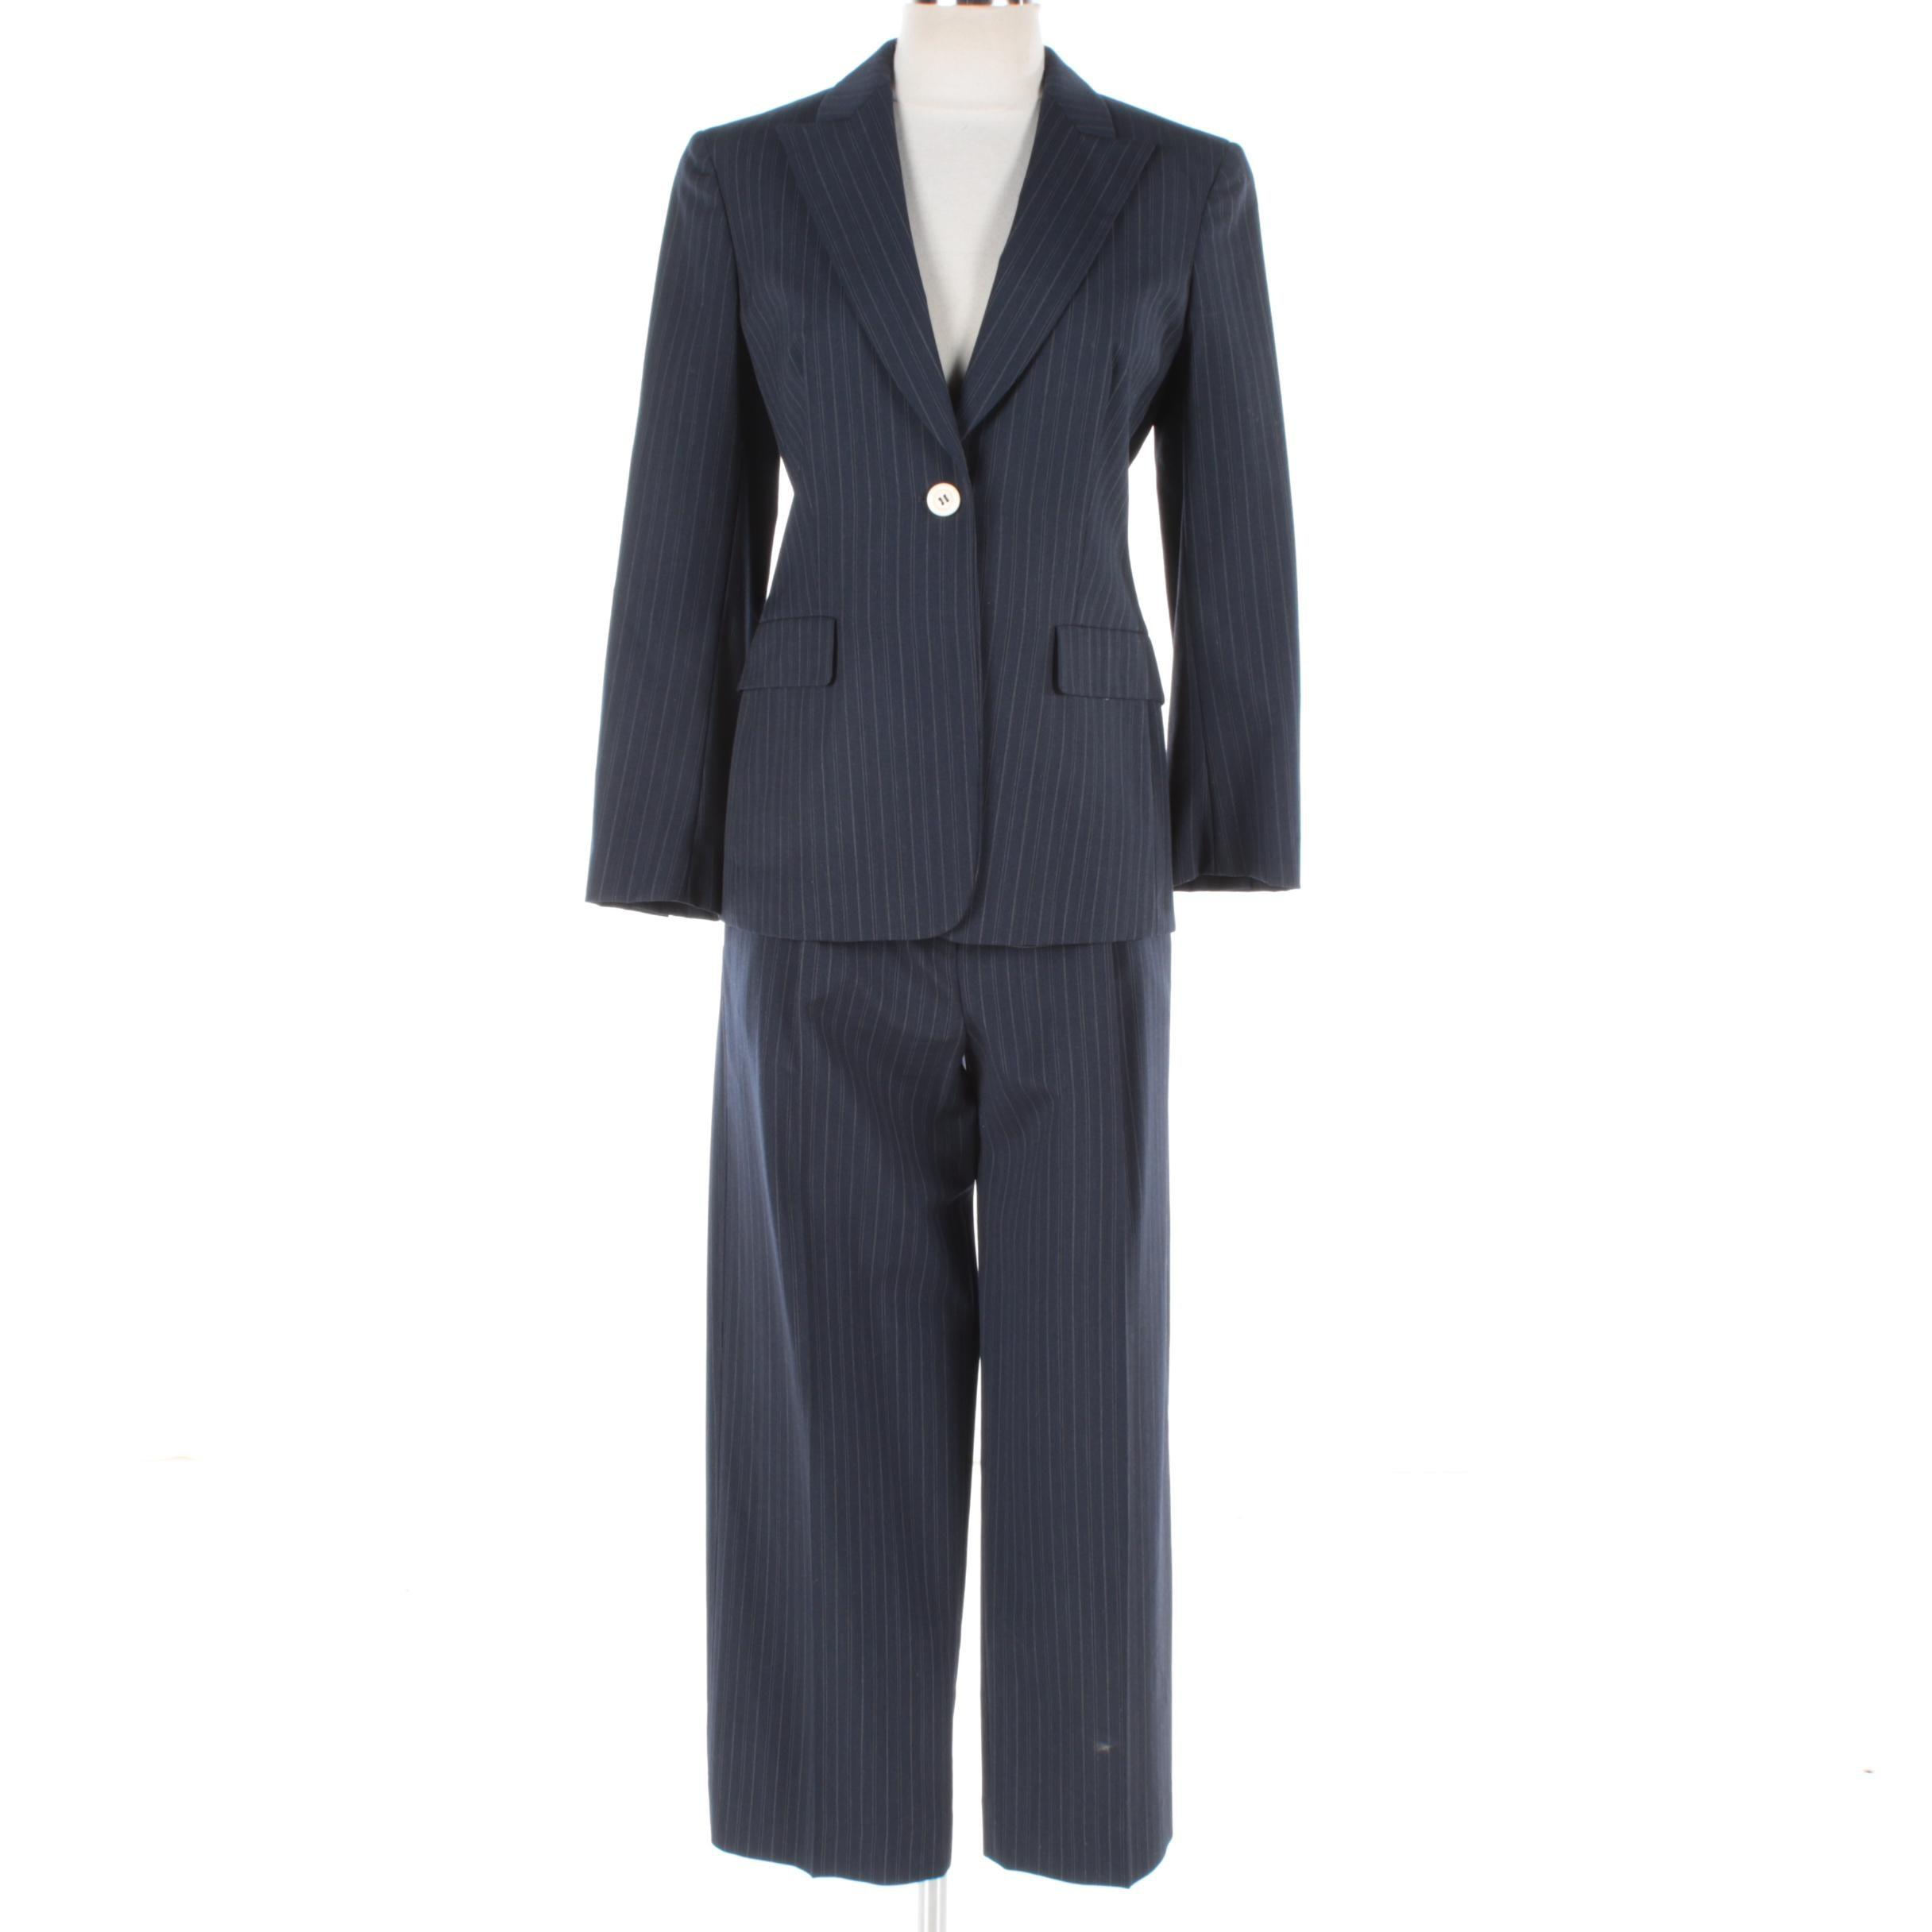 Women's Max Mara Navy Pinstripe Wool Pant Suit